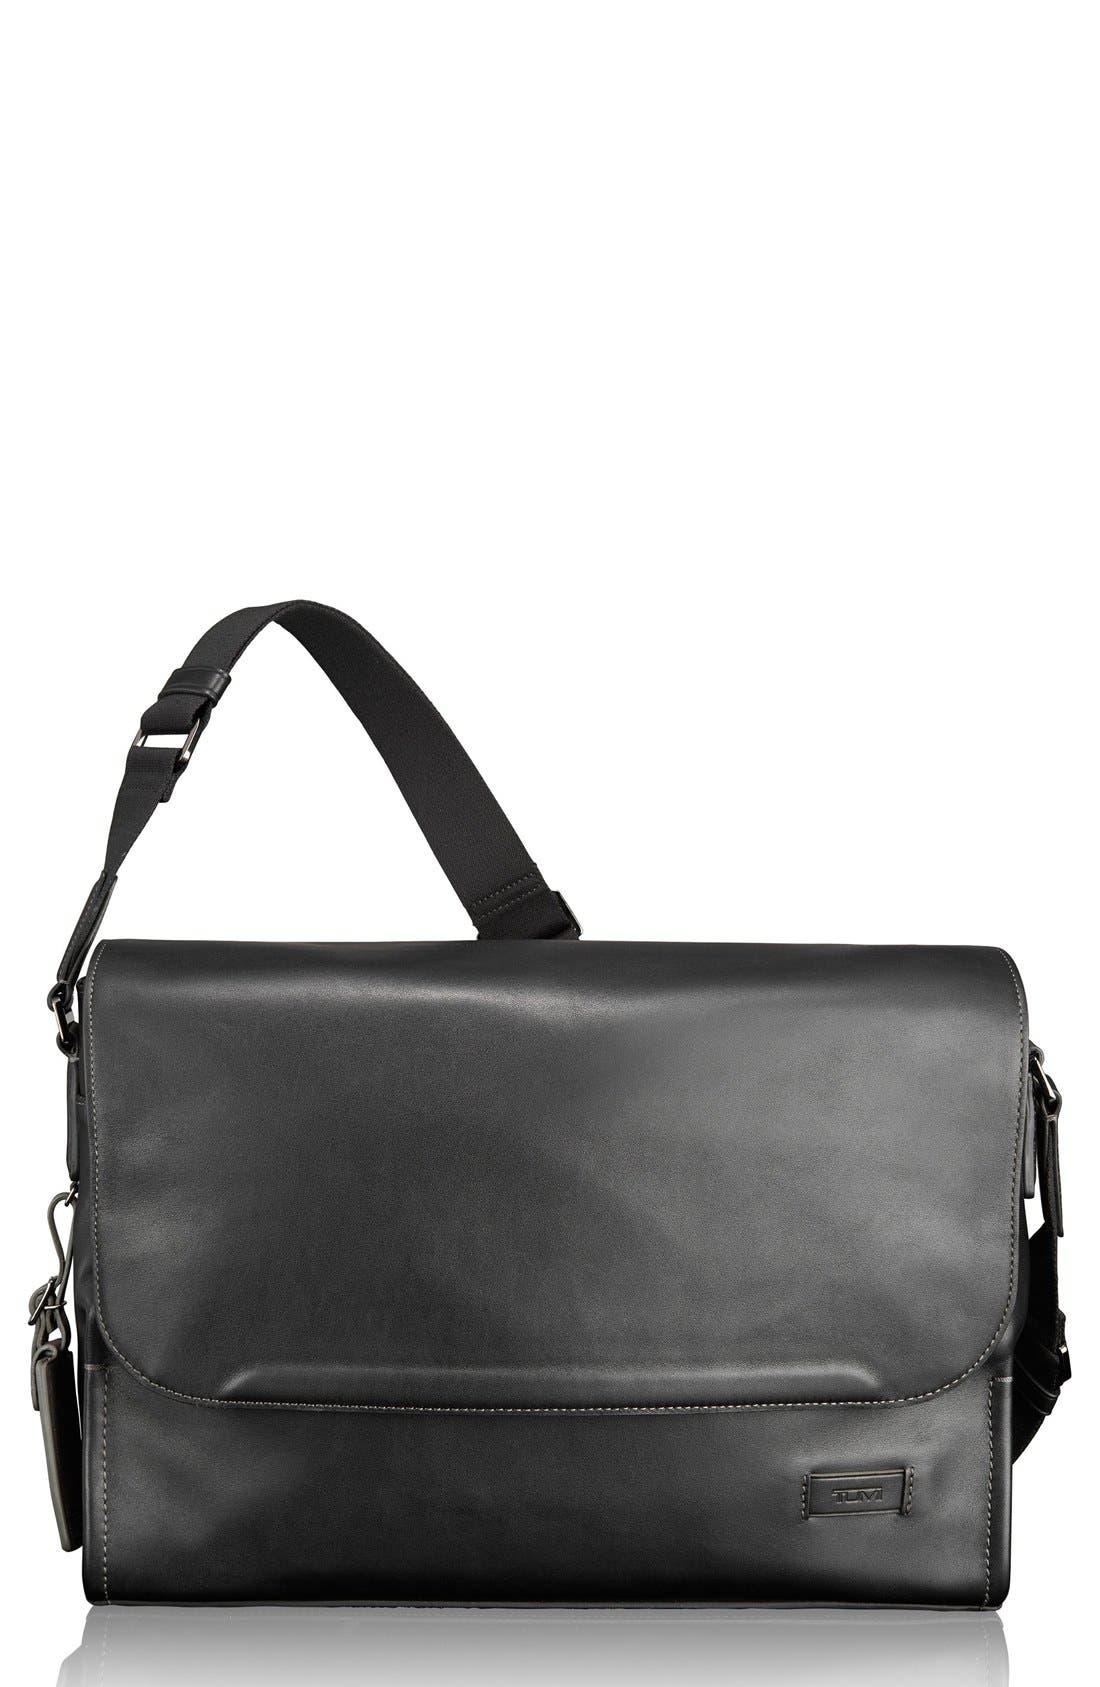 'Harrison - Mathews' Messenger Bag,                         Main,                         color, 001